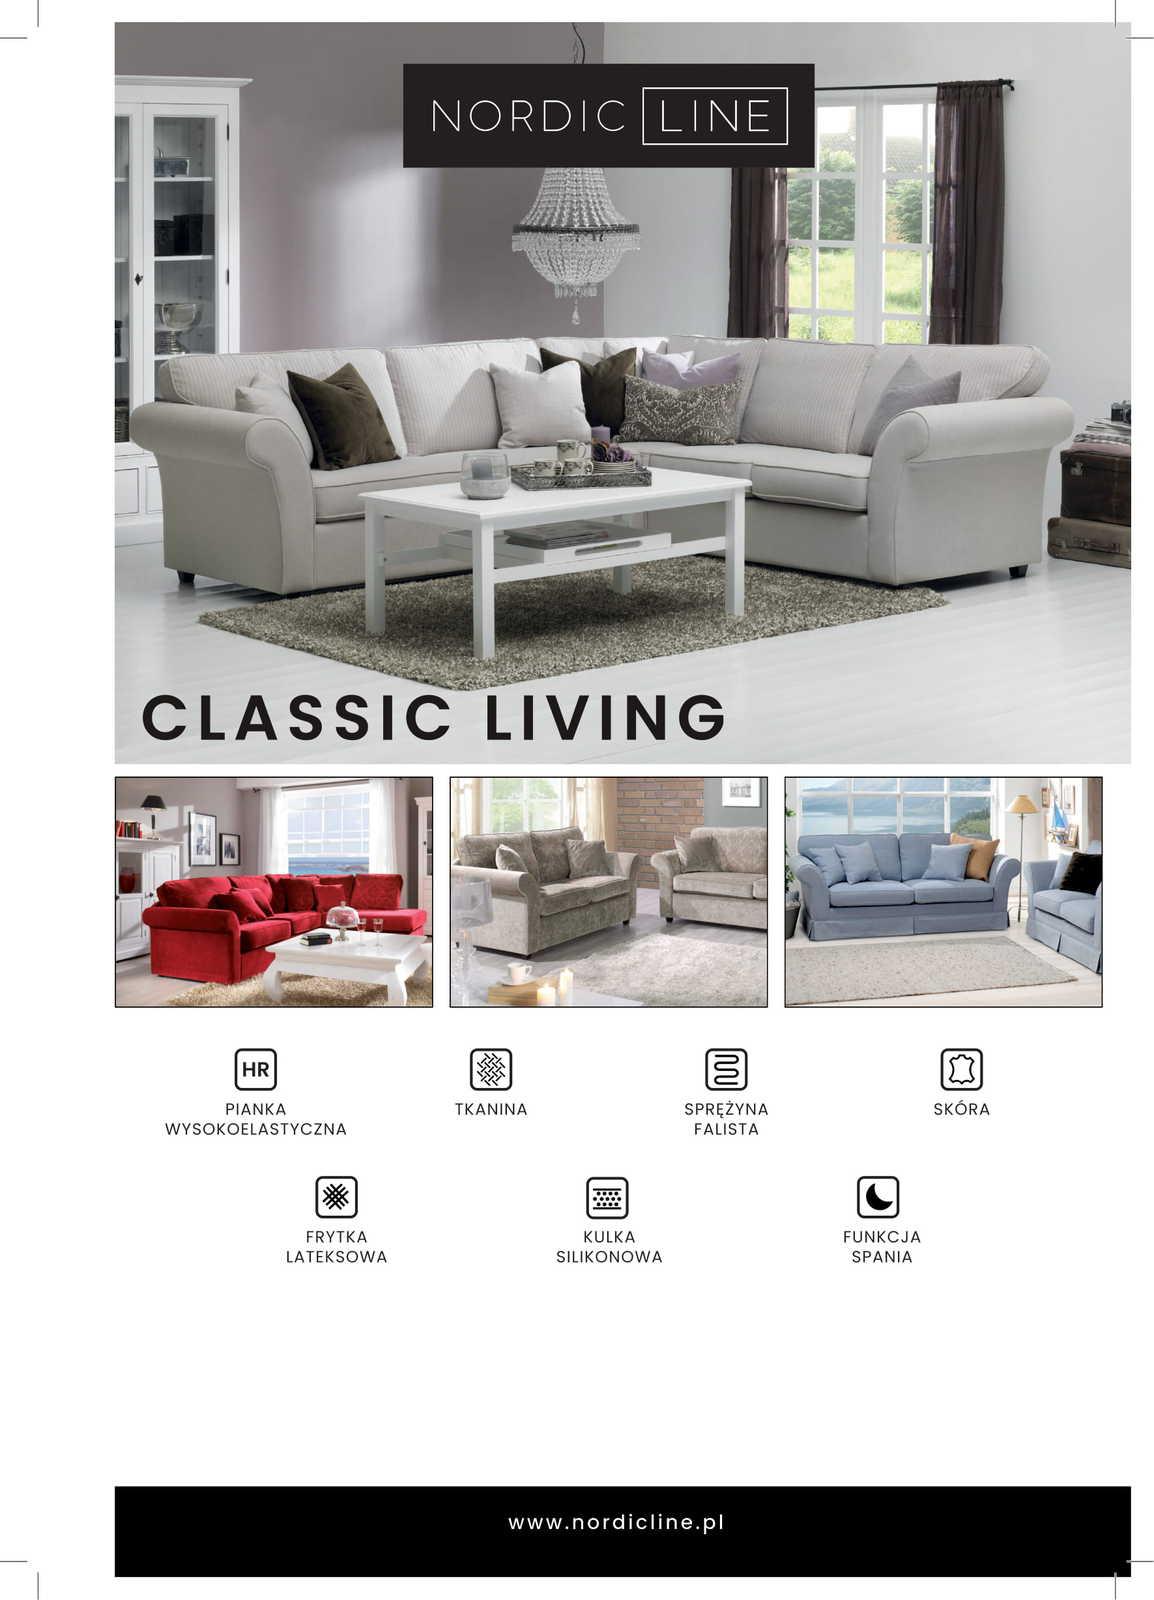 Classic Living(krzywe) (1) 1